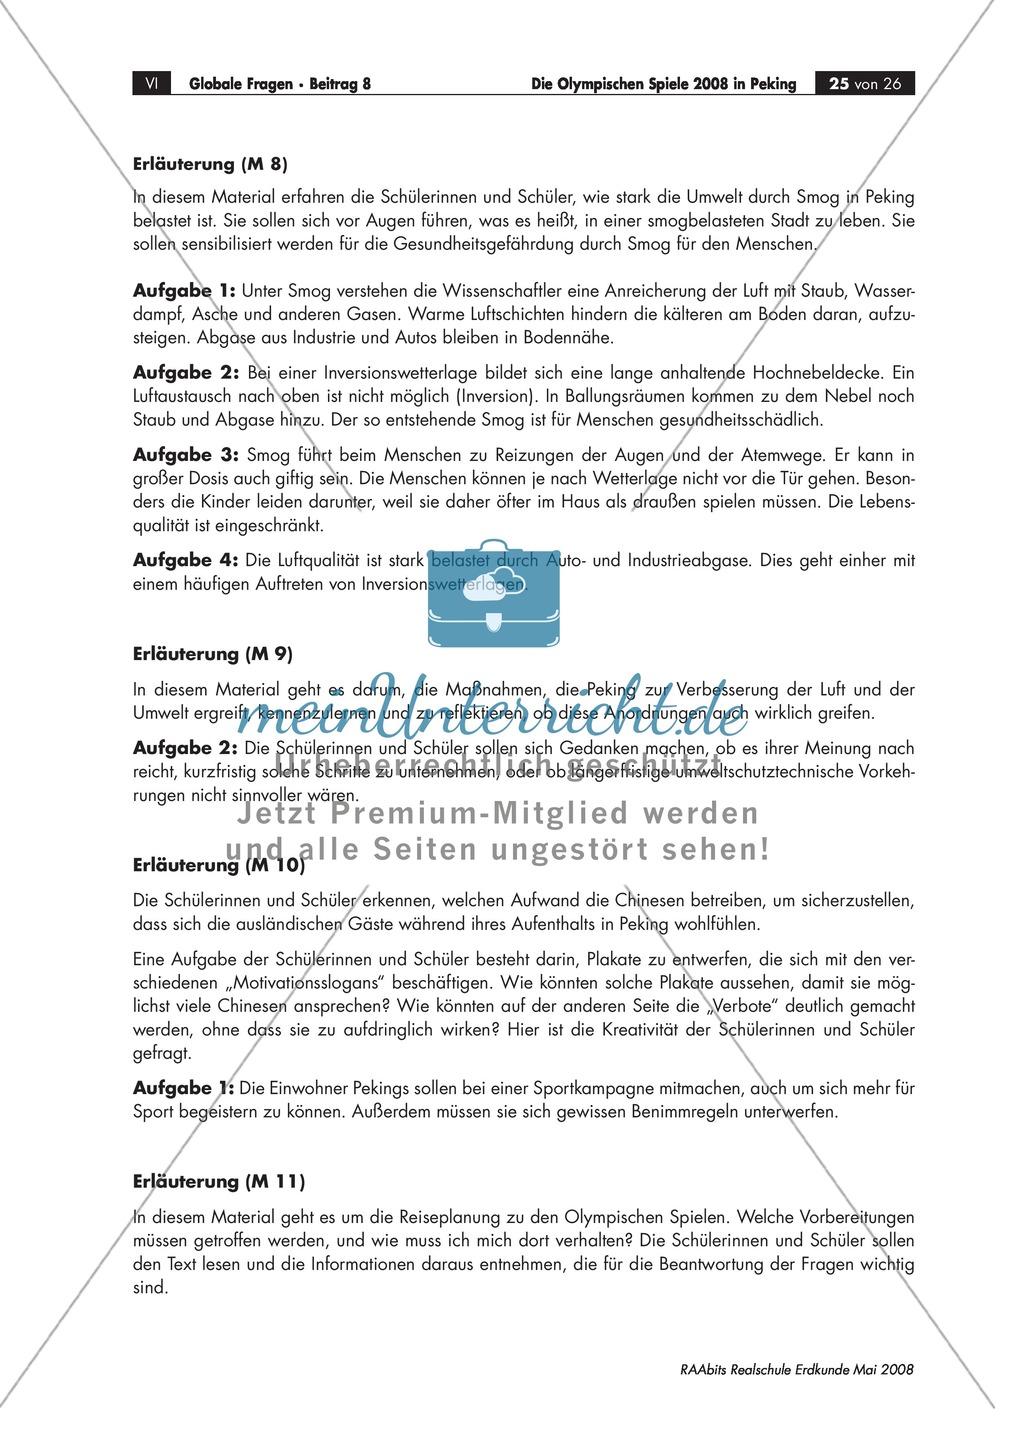 Umweltverschmutzung in Peking: Lösungsansätze + Kampagnen zum Smogproblem bei den Olympischen Spielen diskutieren Preview 3